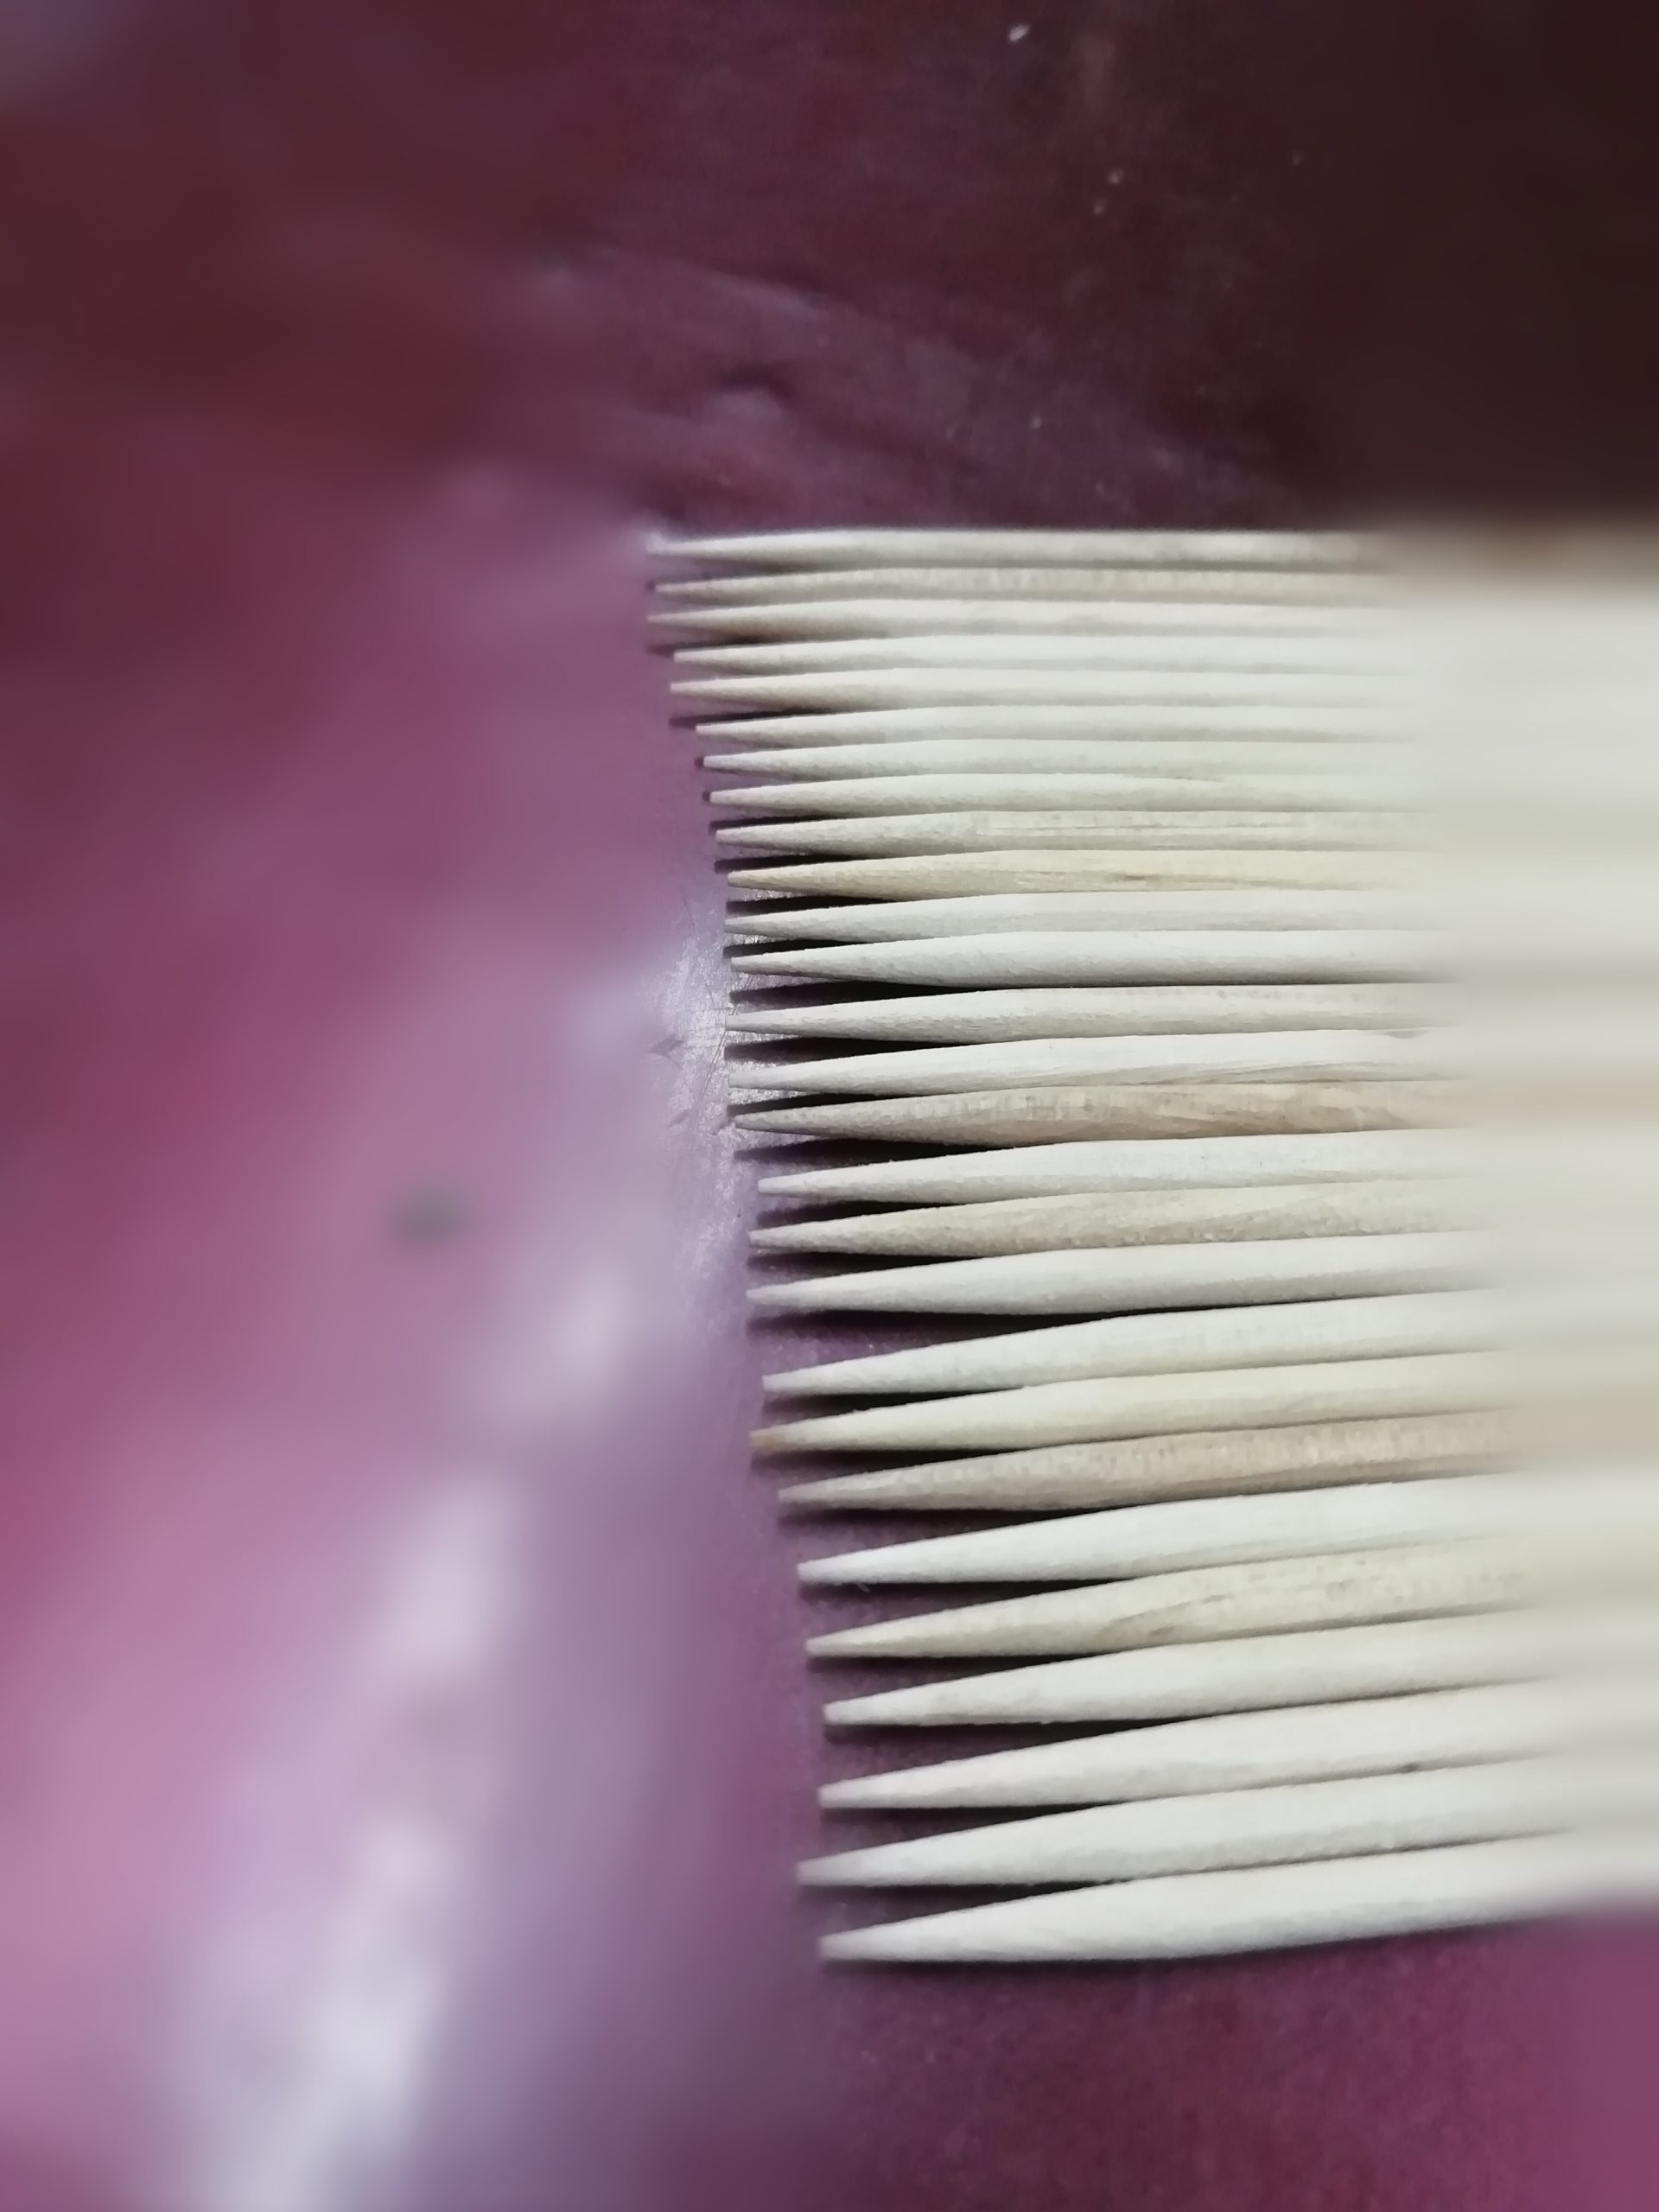 Pointed toothpicks